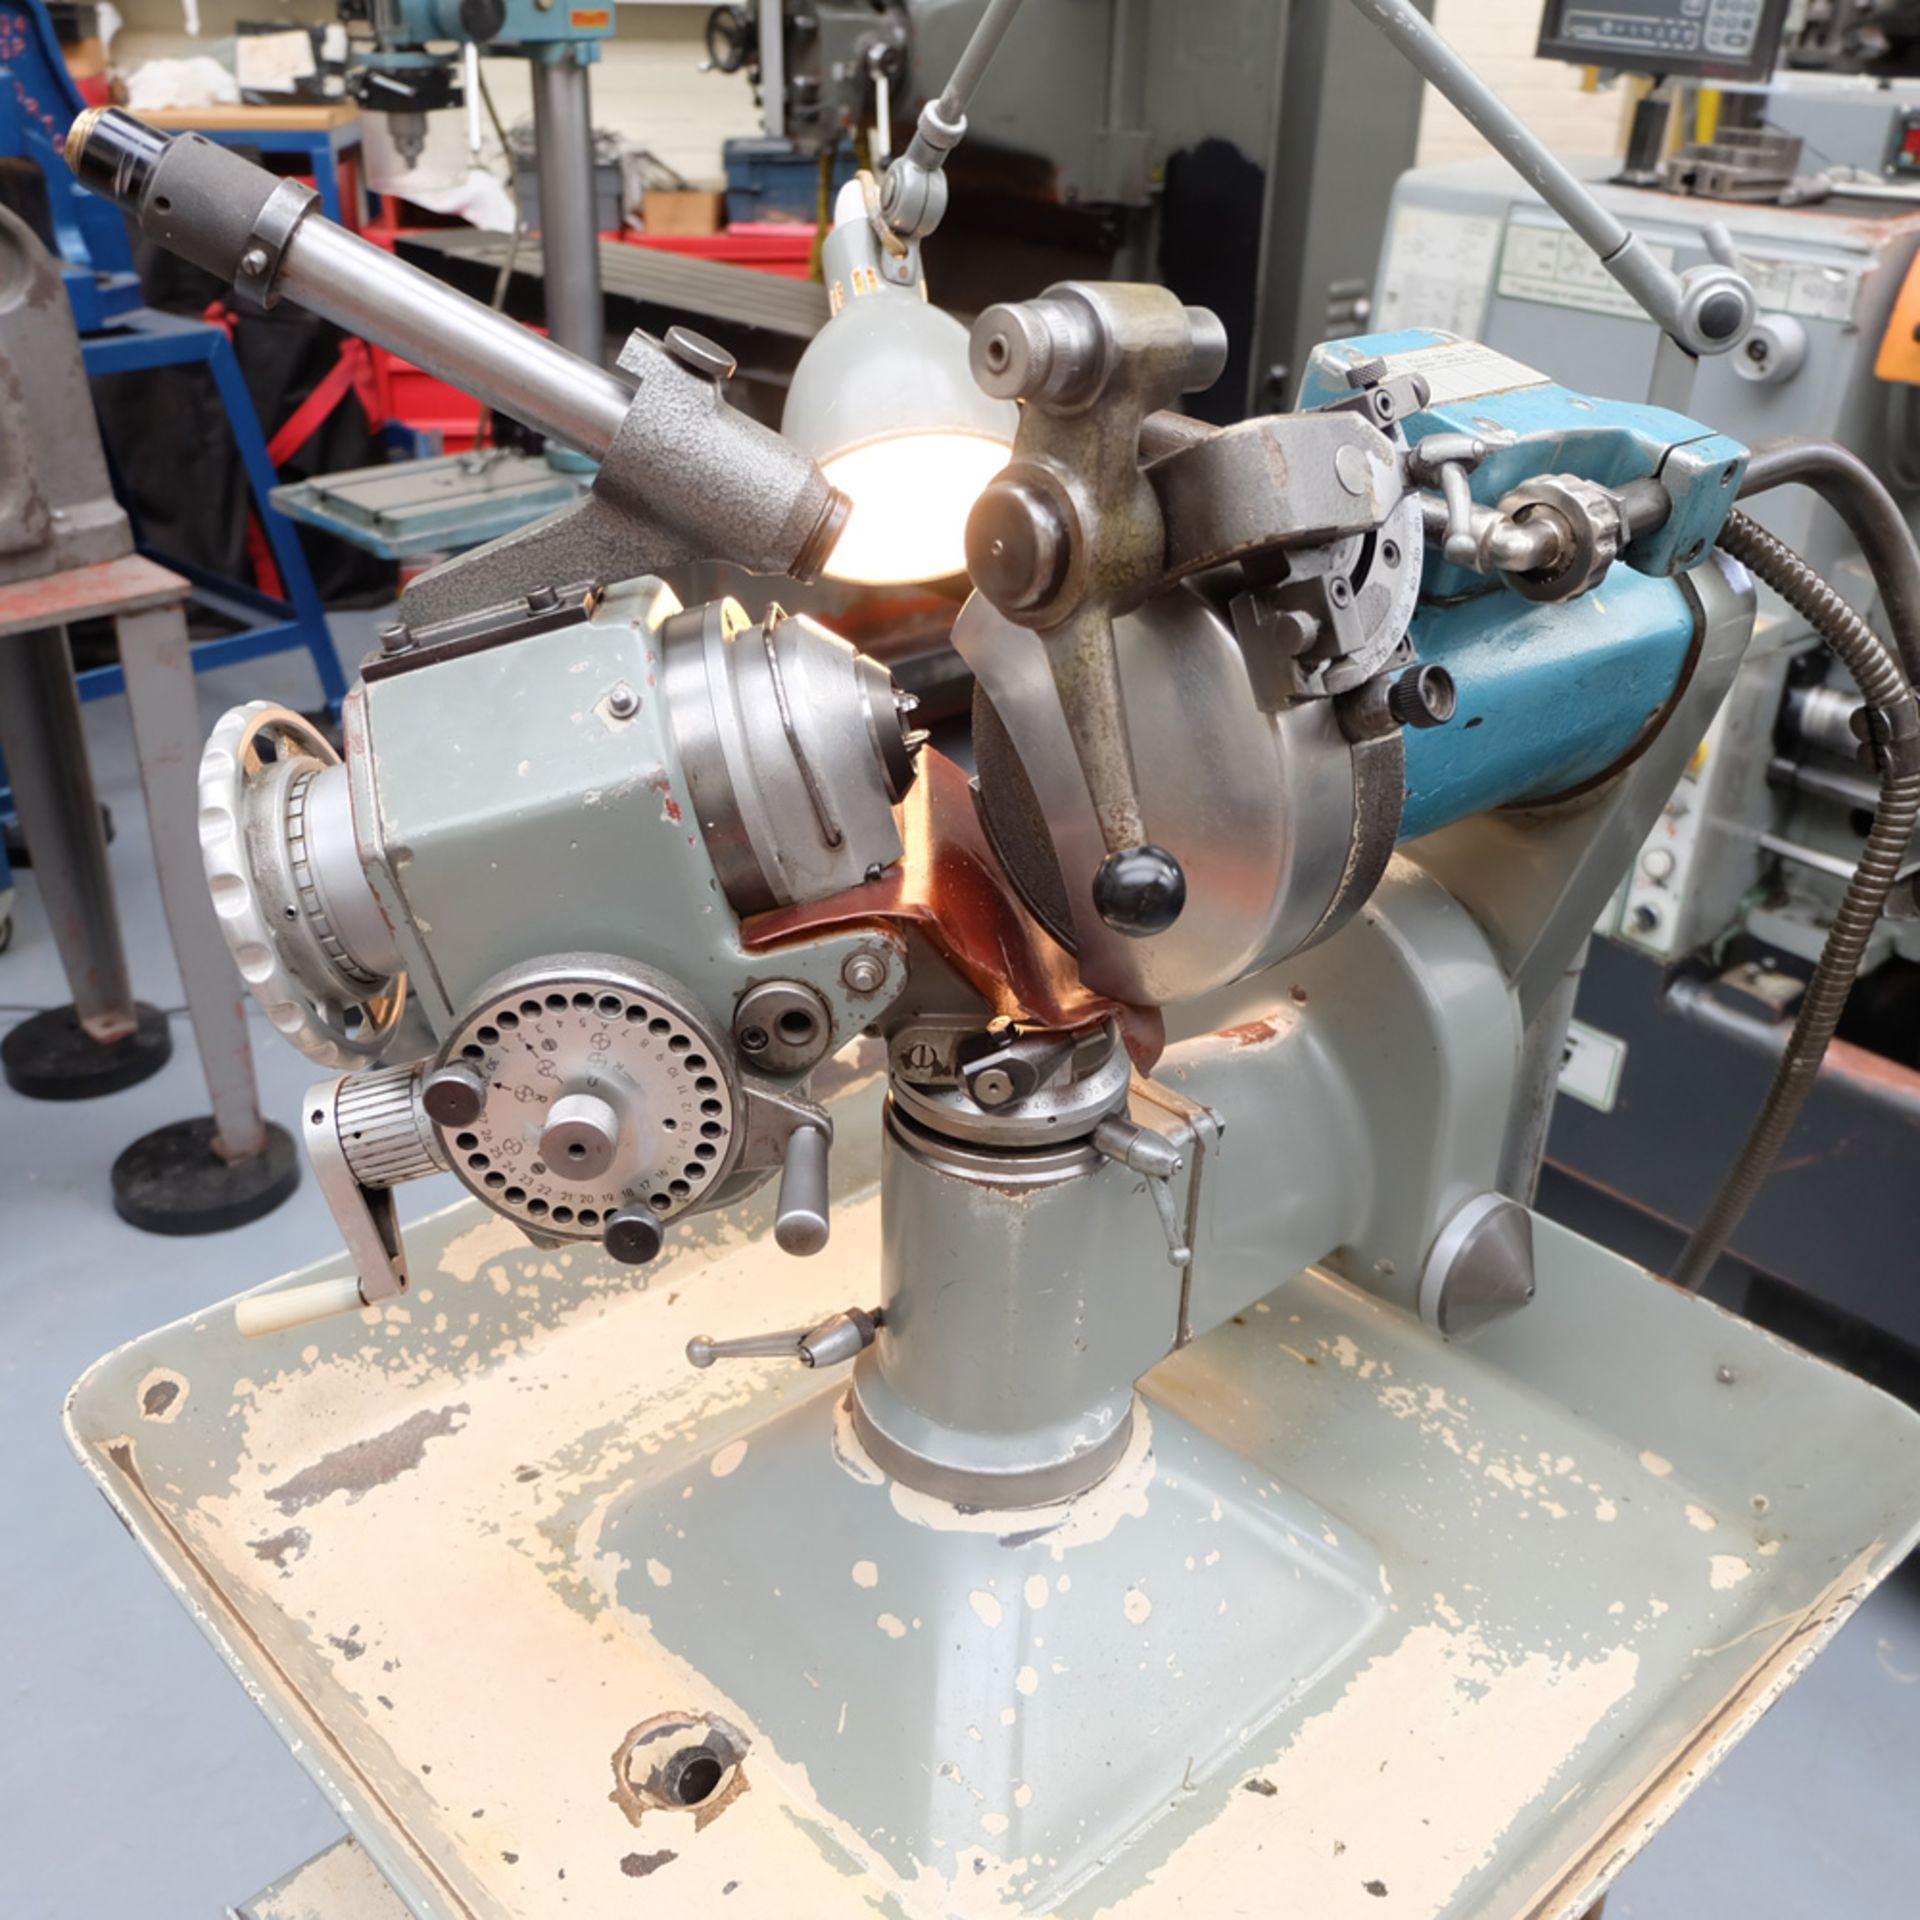 Christen Type 2-32 Twist Drill Grinding Machine. - Image 3 of 14